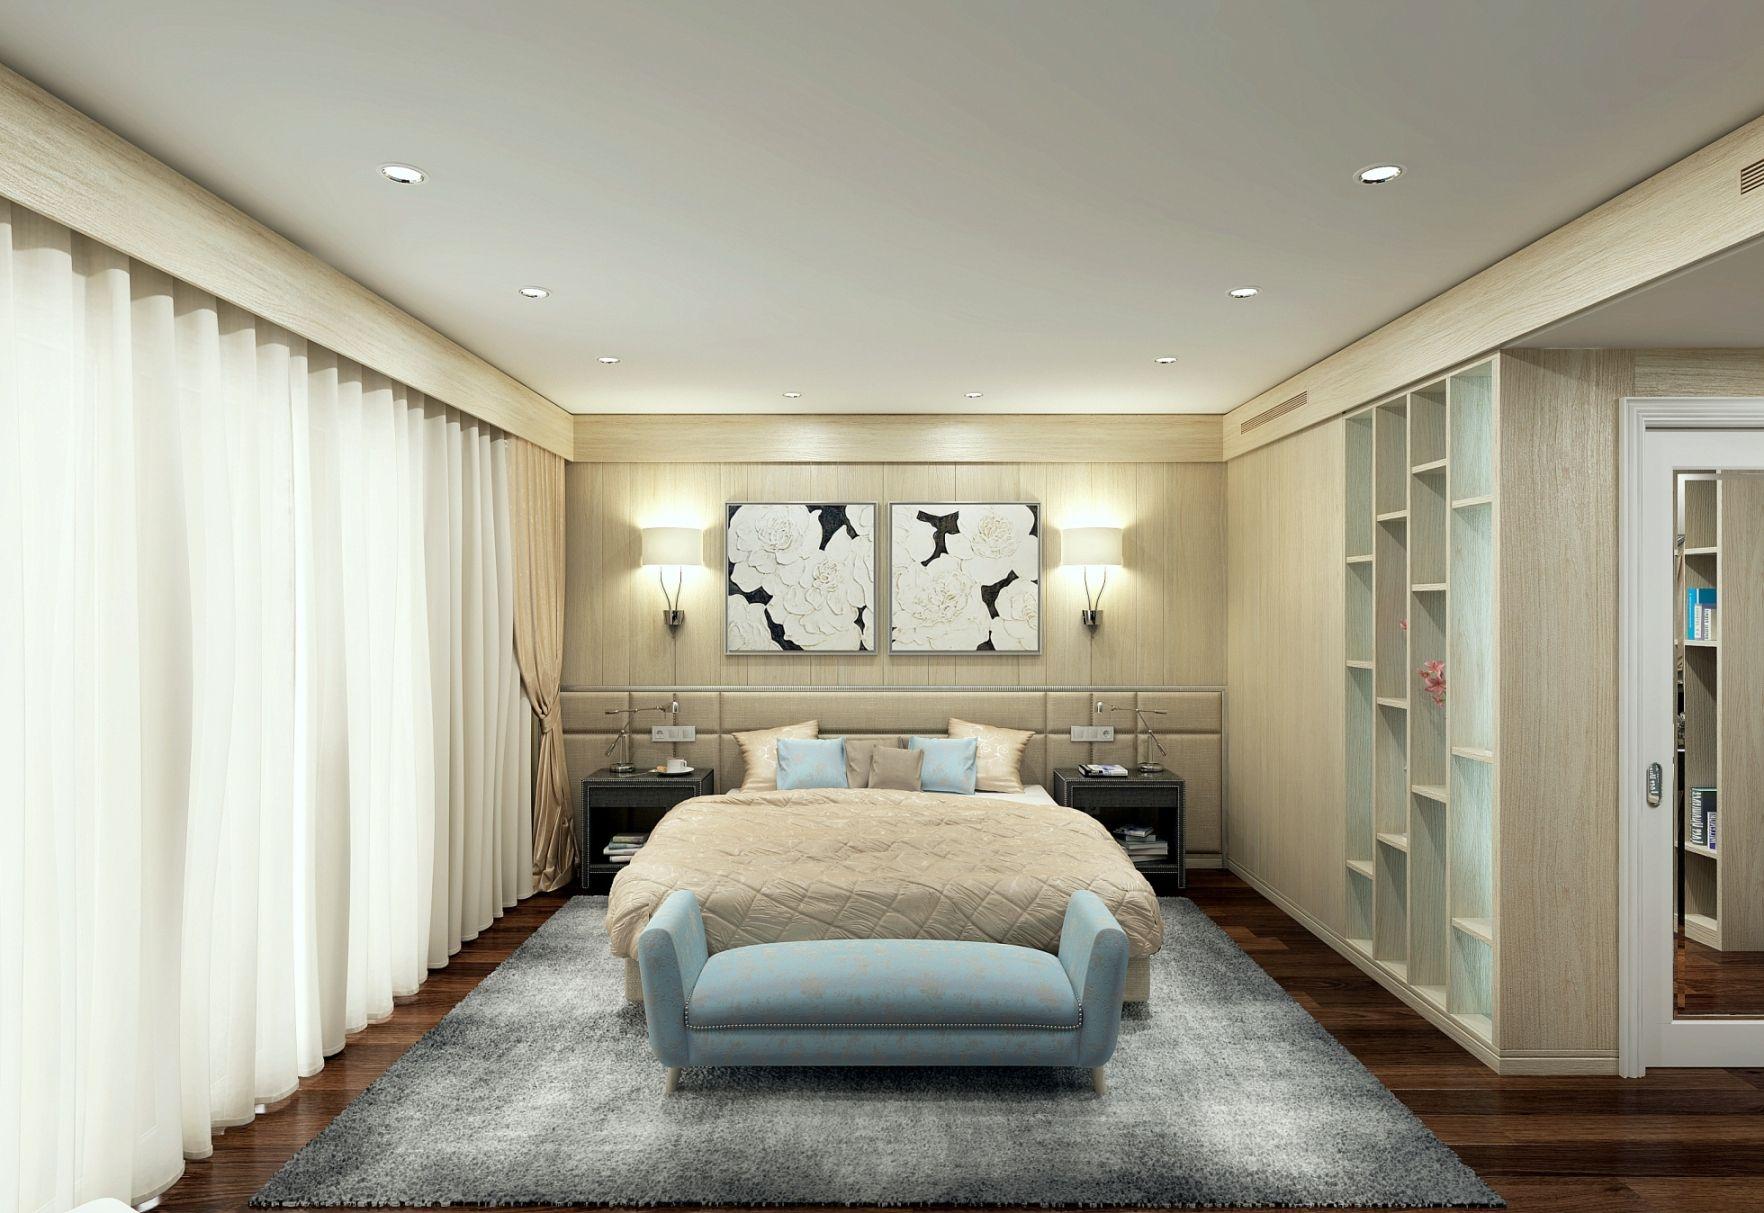 Design Of Master Bedroom Interior For Private House In Castelldefels 08860 Barcelona Spain Alexander